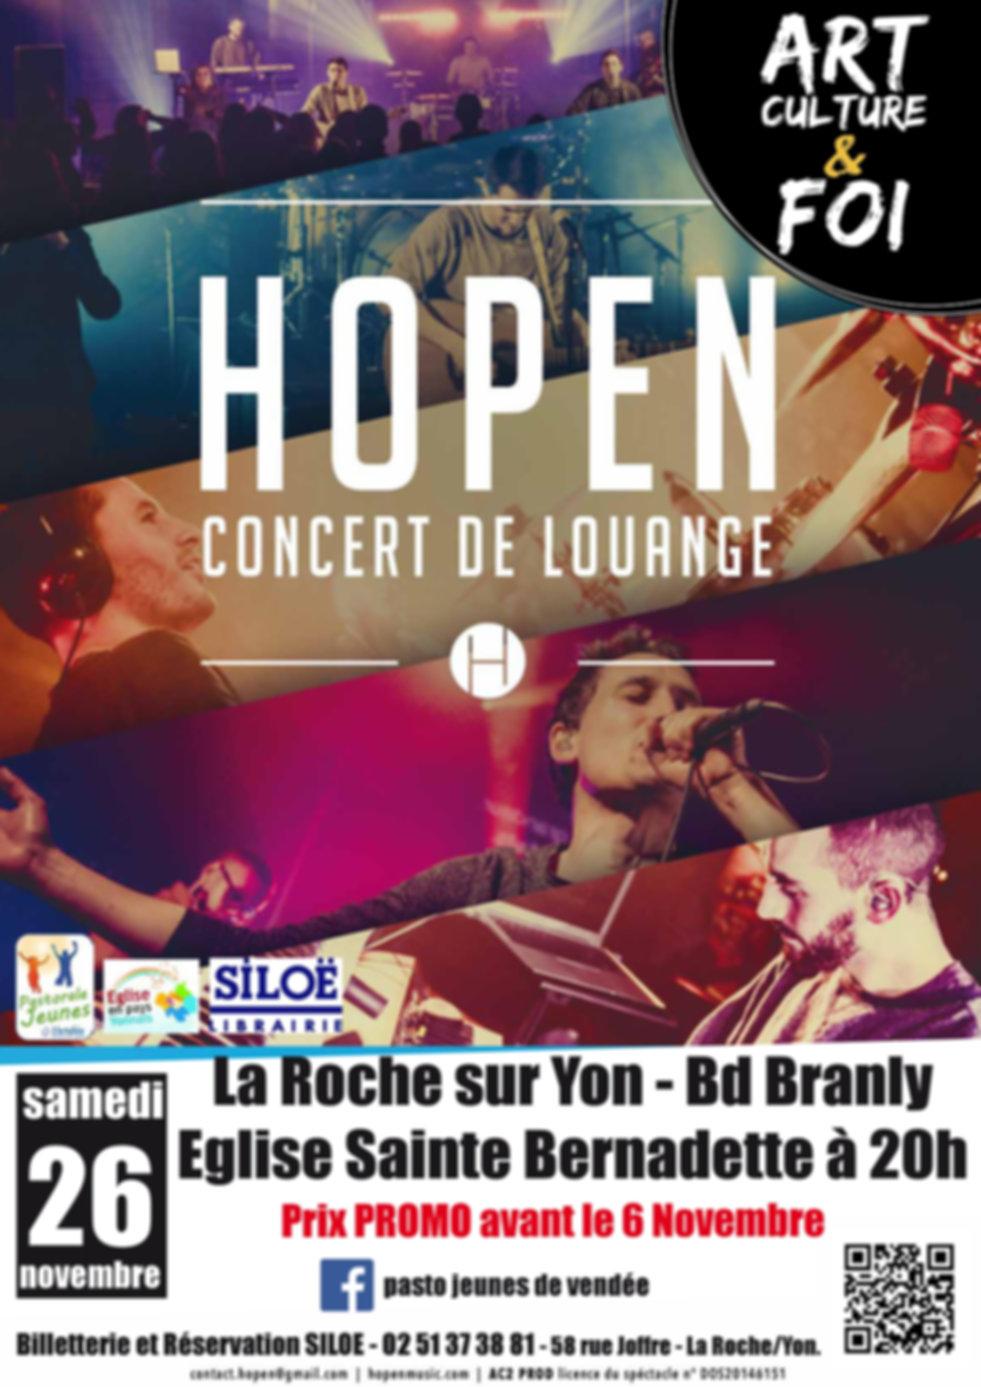 Hopen concert roche yon 2016